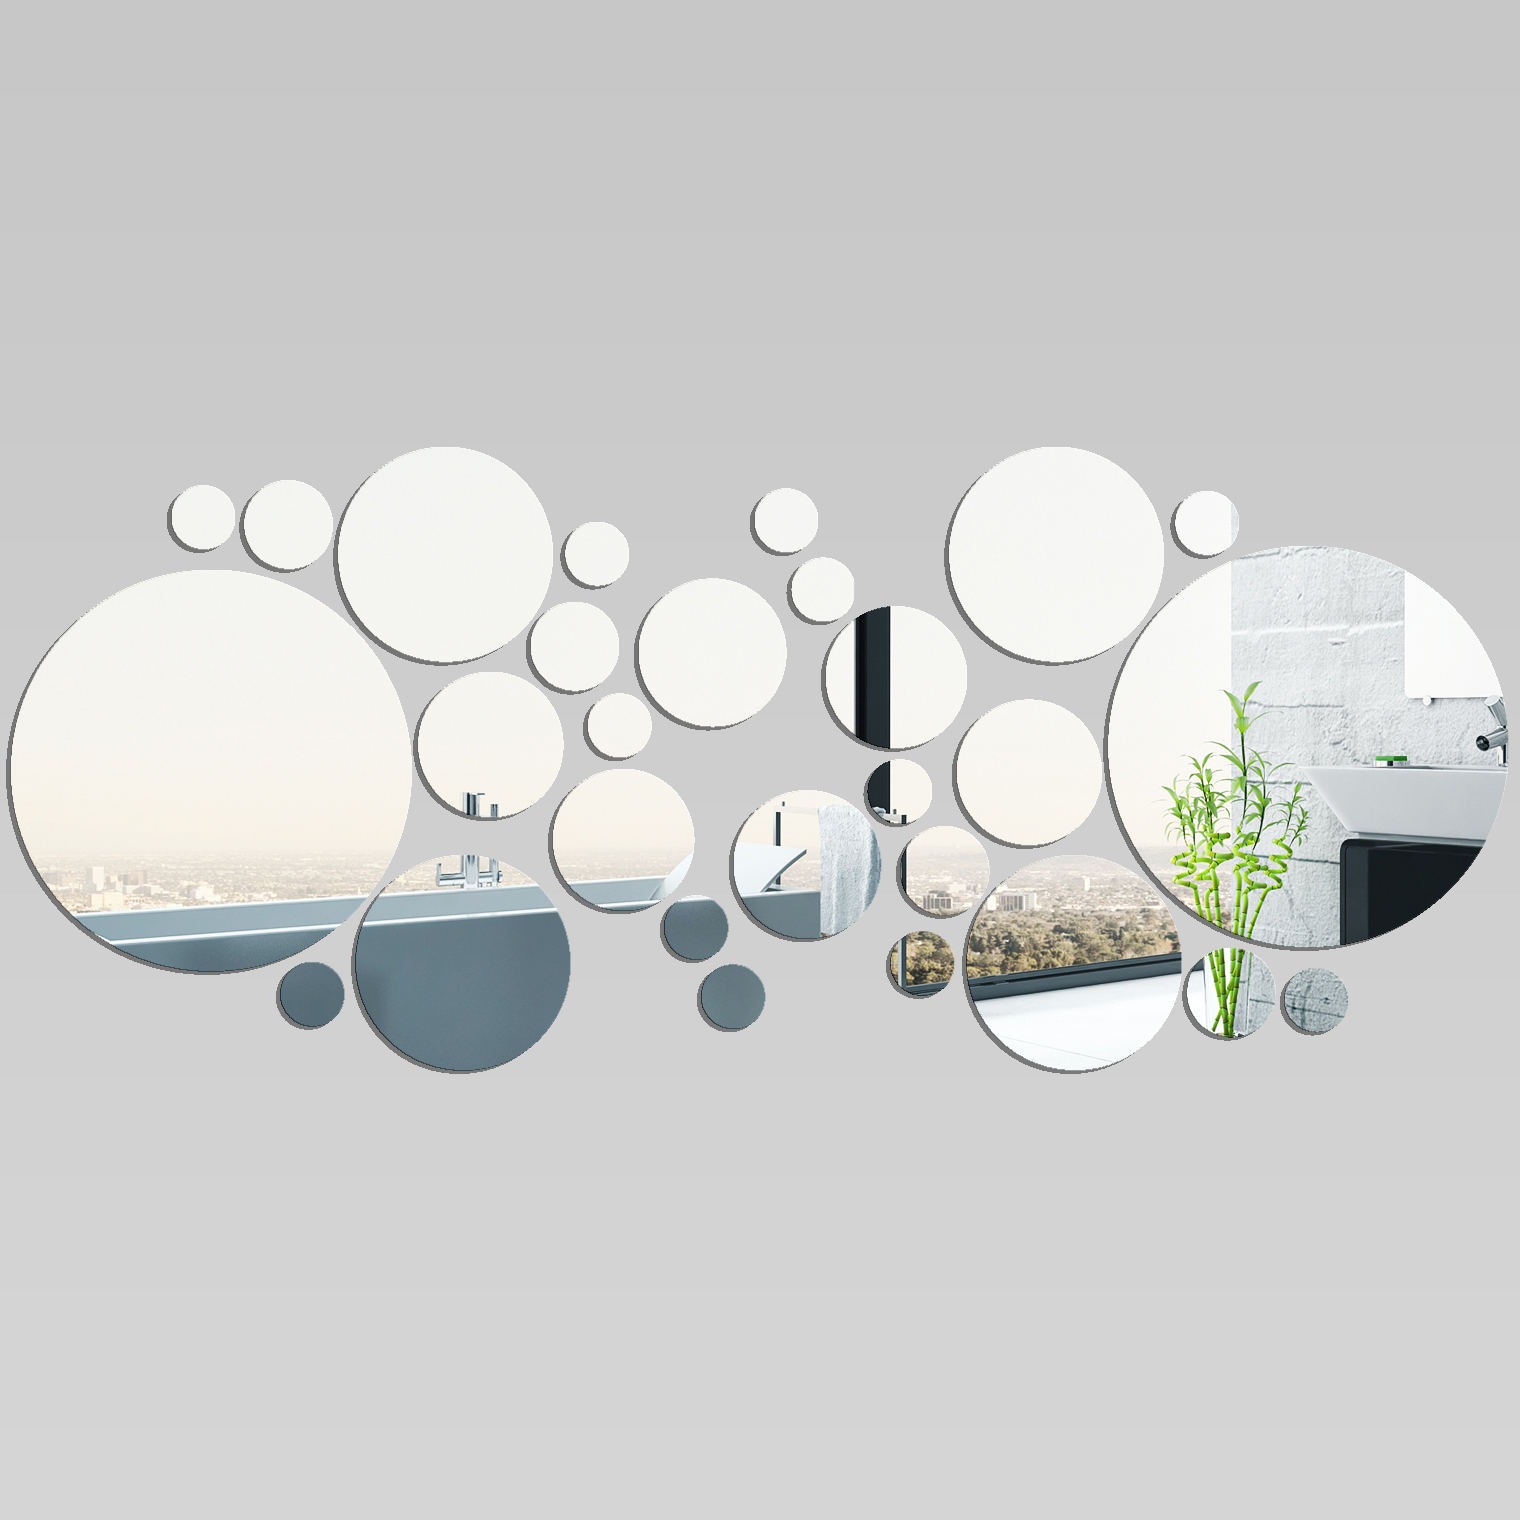 Vinilos folies espejos decorativo acr lico pl xiglas for Espejos redondos decorativos